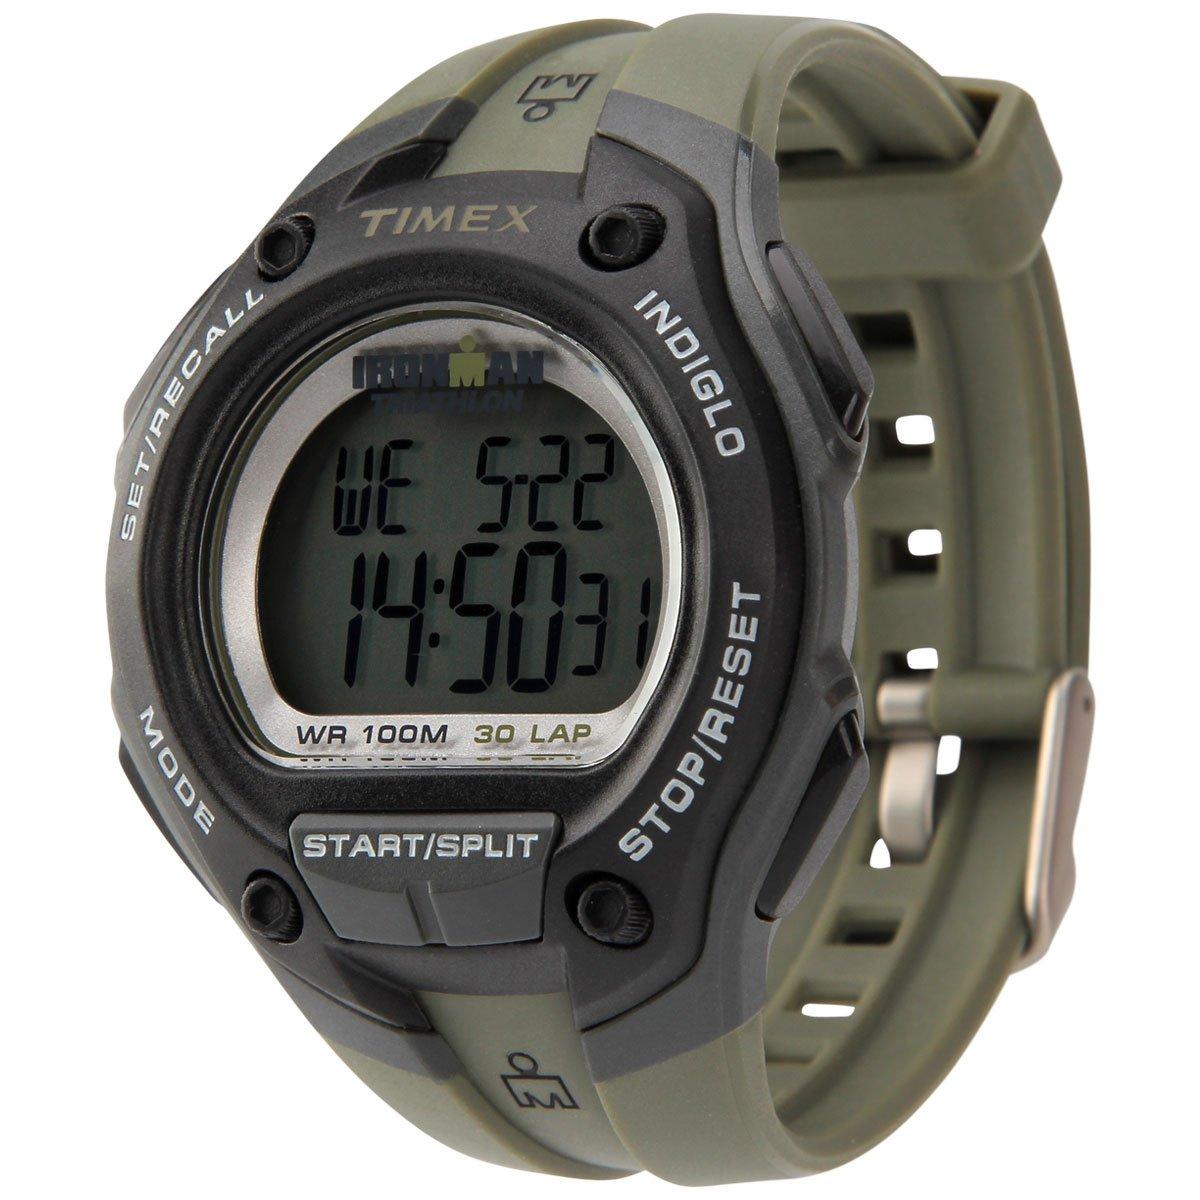 5842f8156797 Relógio Timex Ironman 30 Lap Oversize T5K41